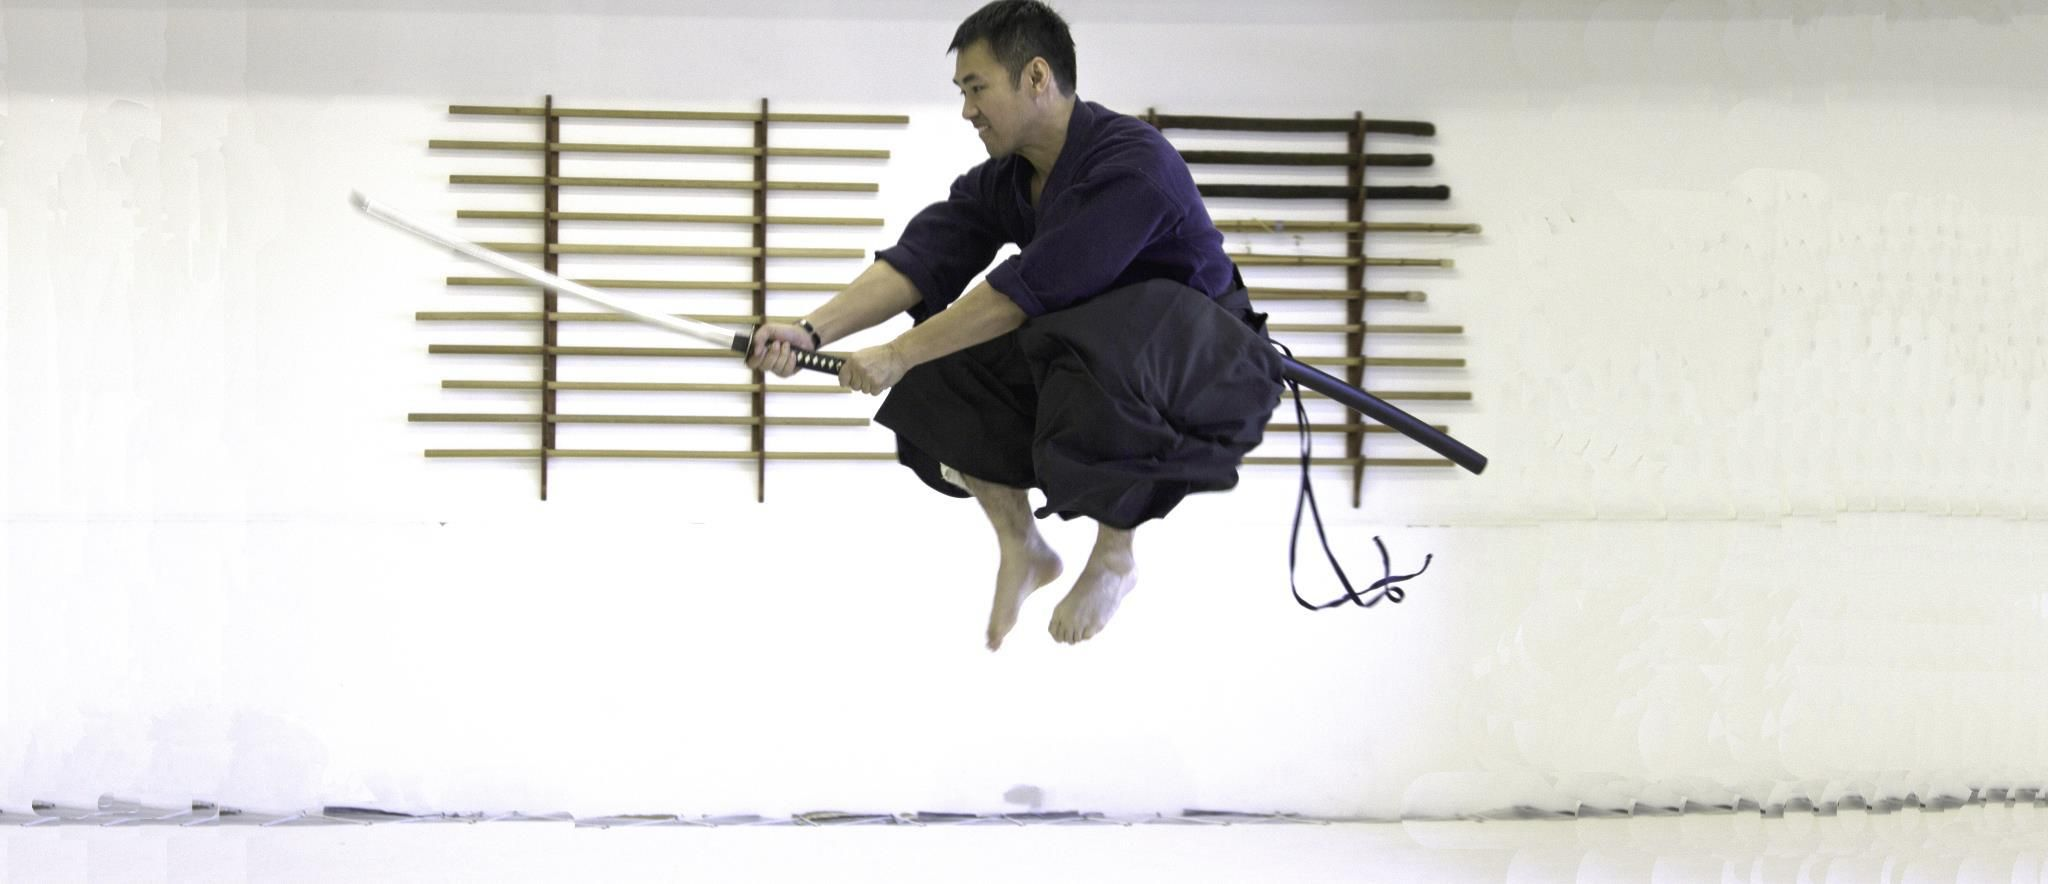 katori shinto ryu - Yahoo Image Search Results